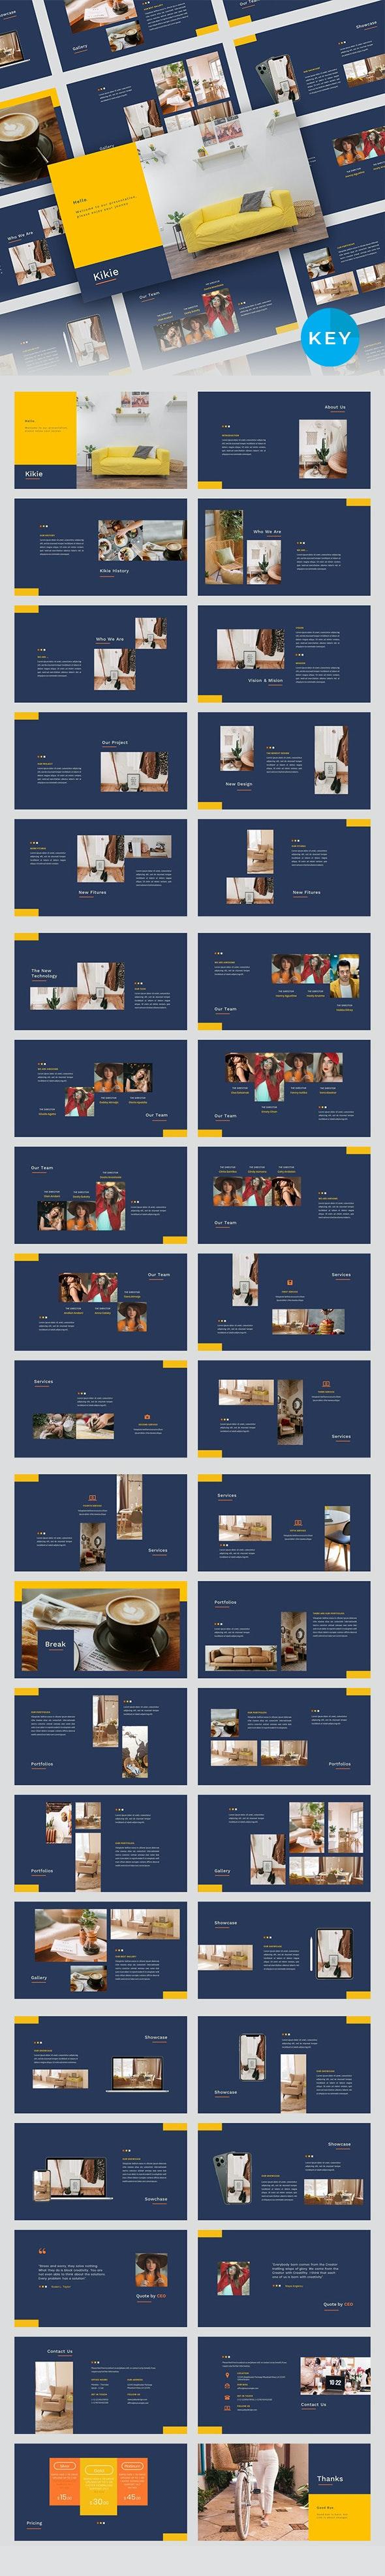 Kikie – Creative Business & Elegant Keynote Template - Business Keynote Templates